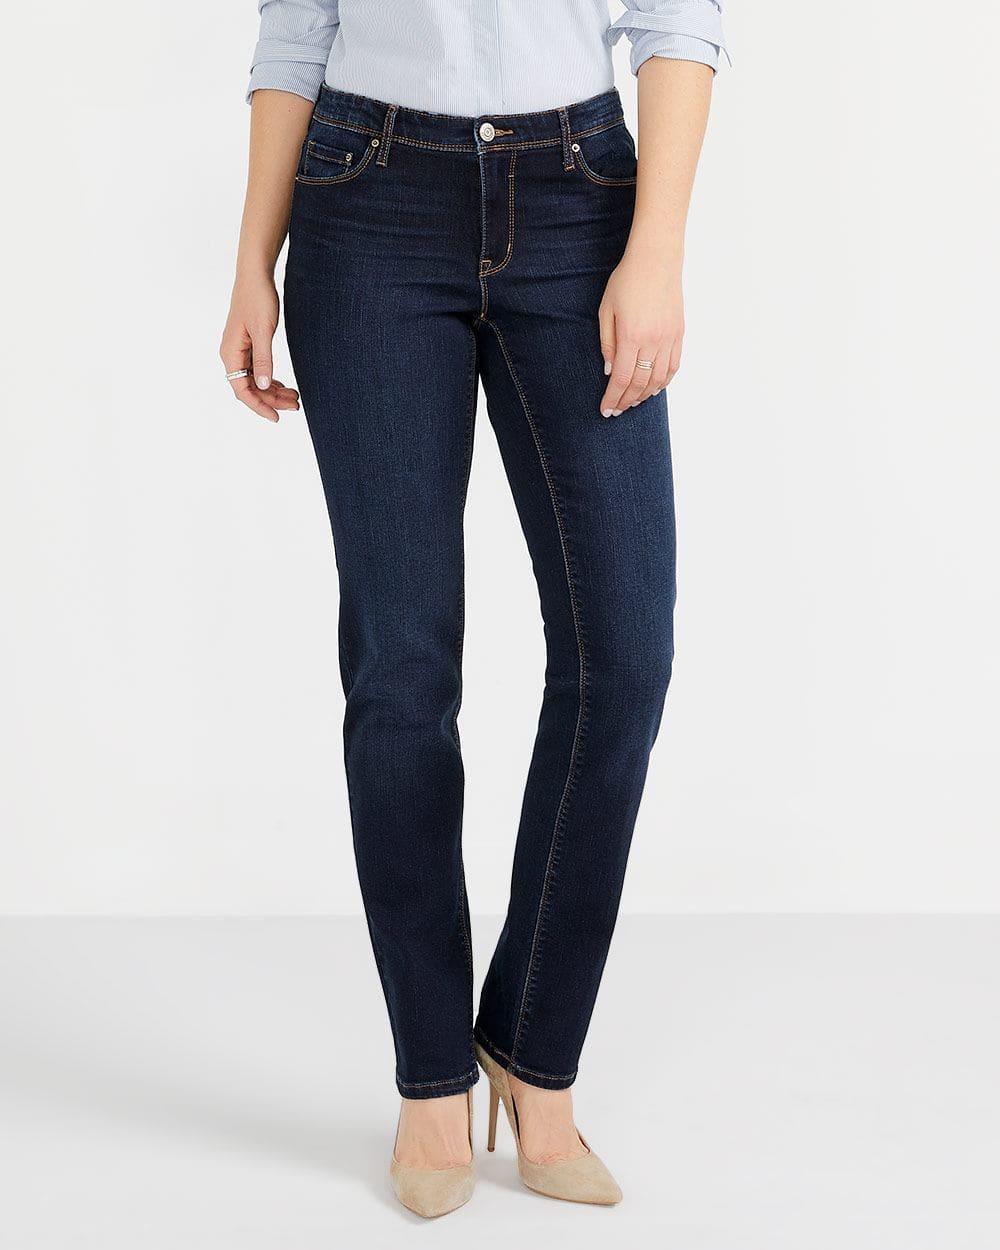 The Tall Insider Dark Wash Straight Leg Jeans